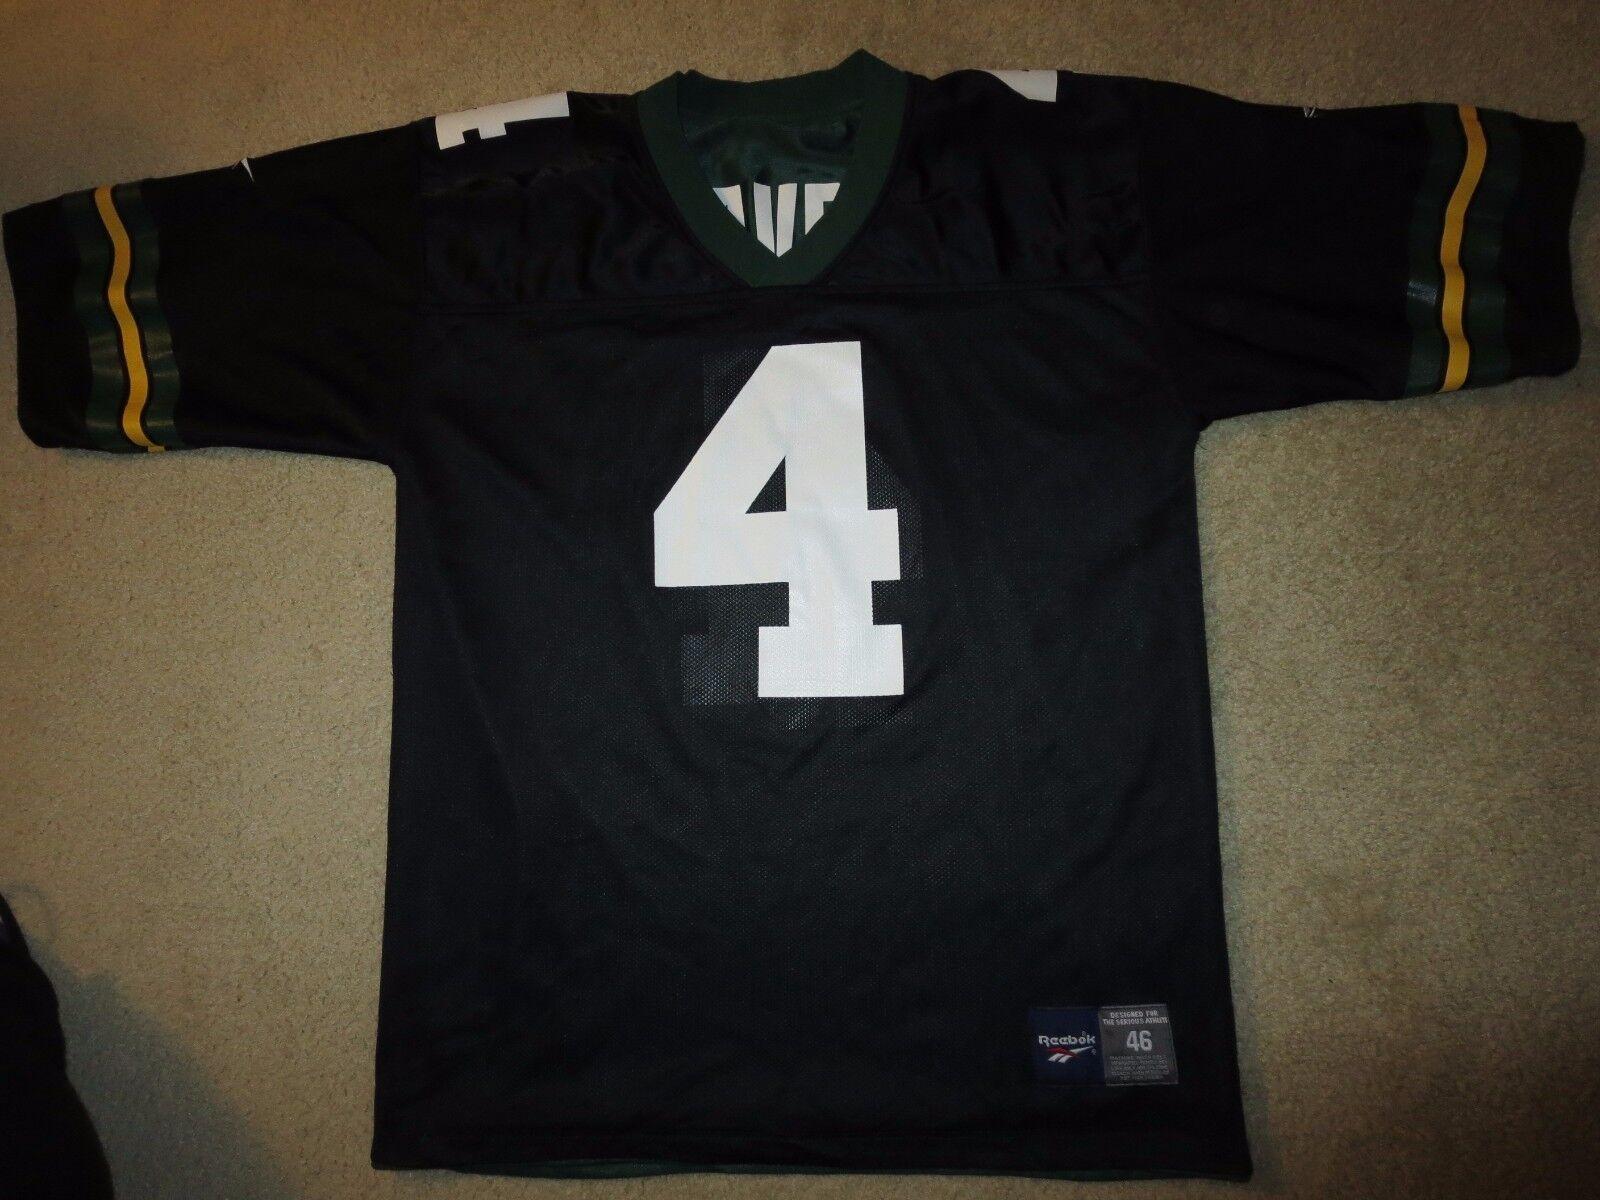 Brett Favre verde Bay Packers Negro Edición Reebok NFL Jersey M M Hombres 46